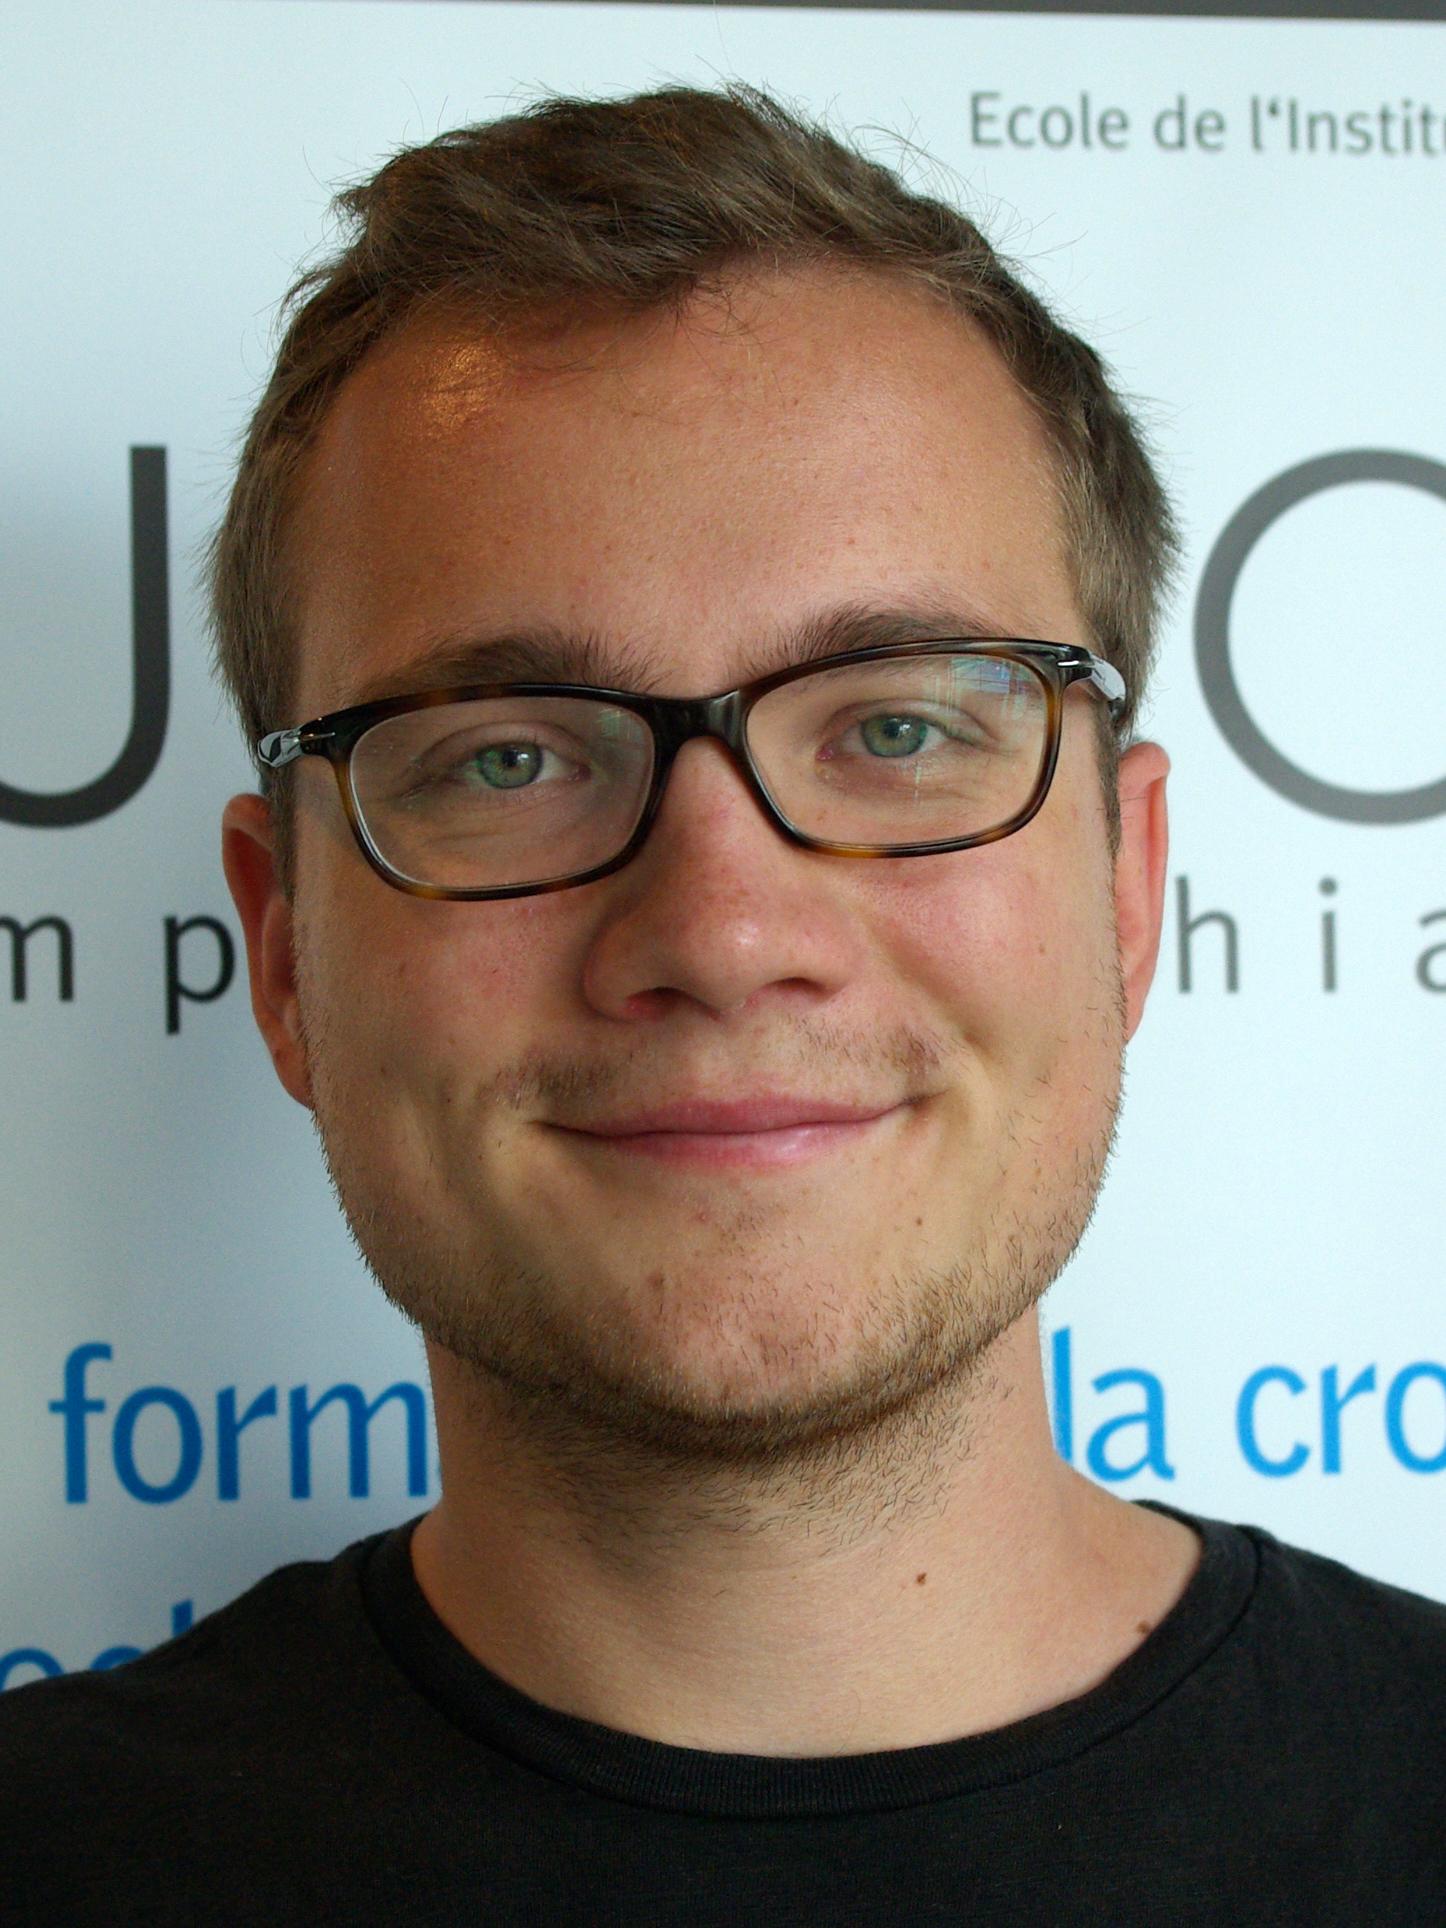 Jonas Florian WACKER